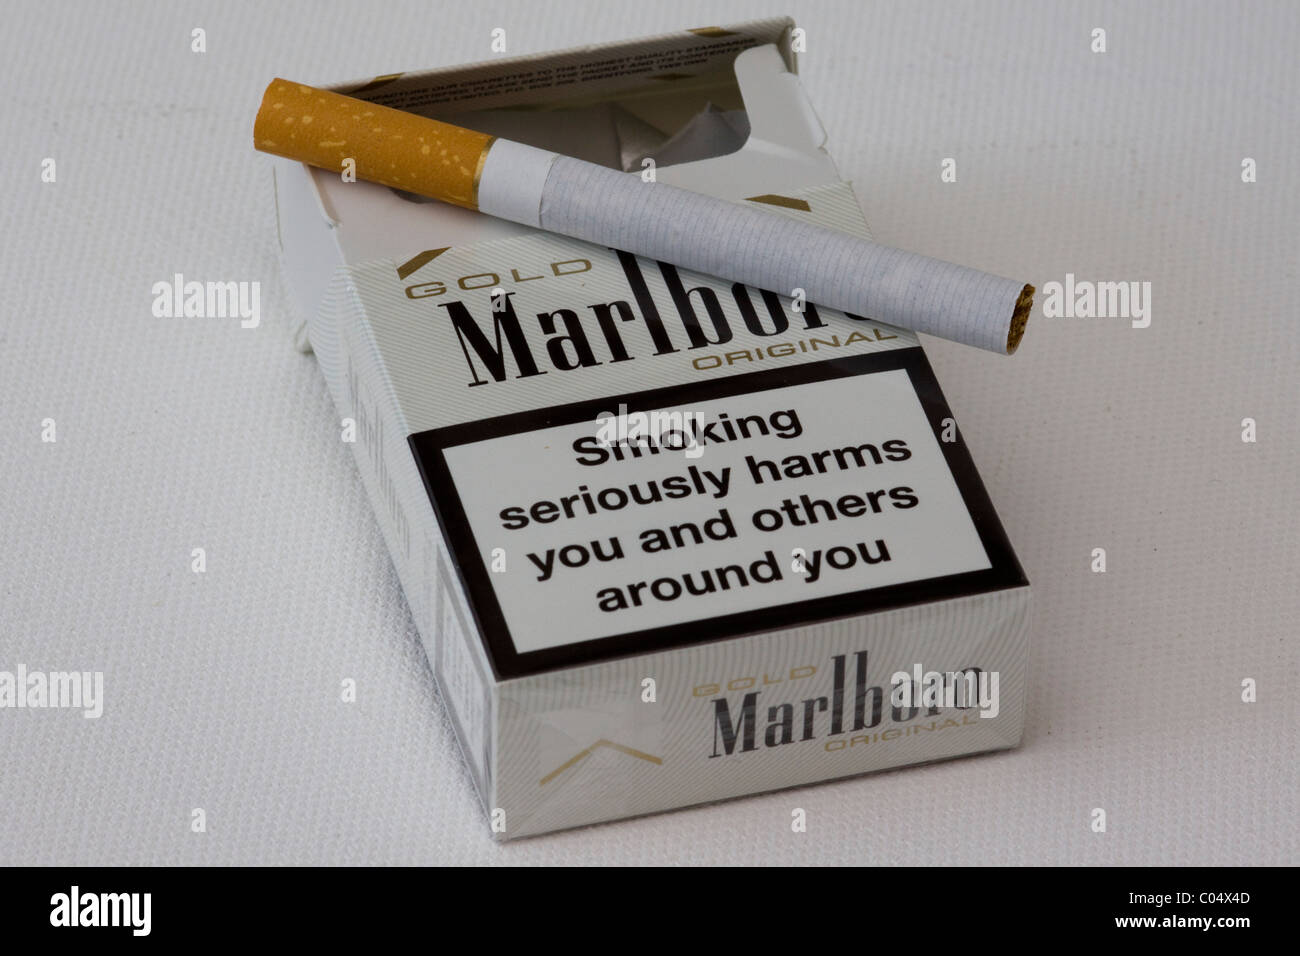 United States buy cigarettes